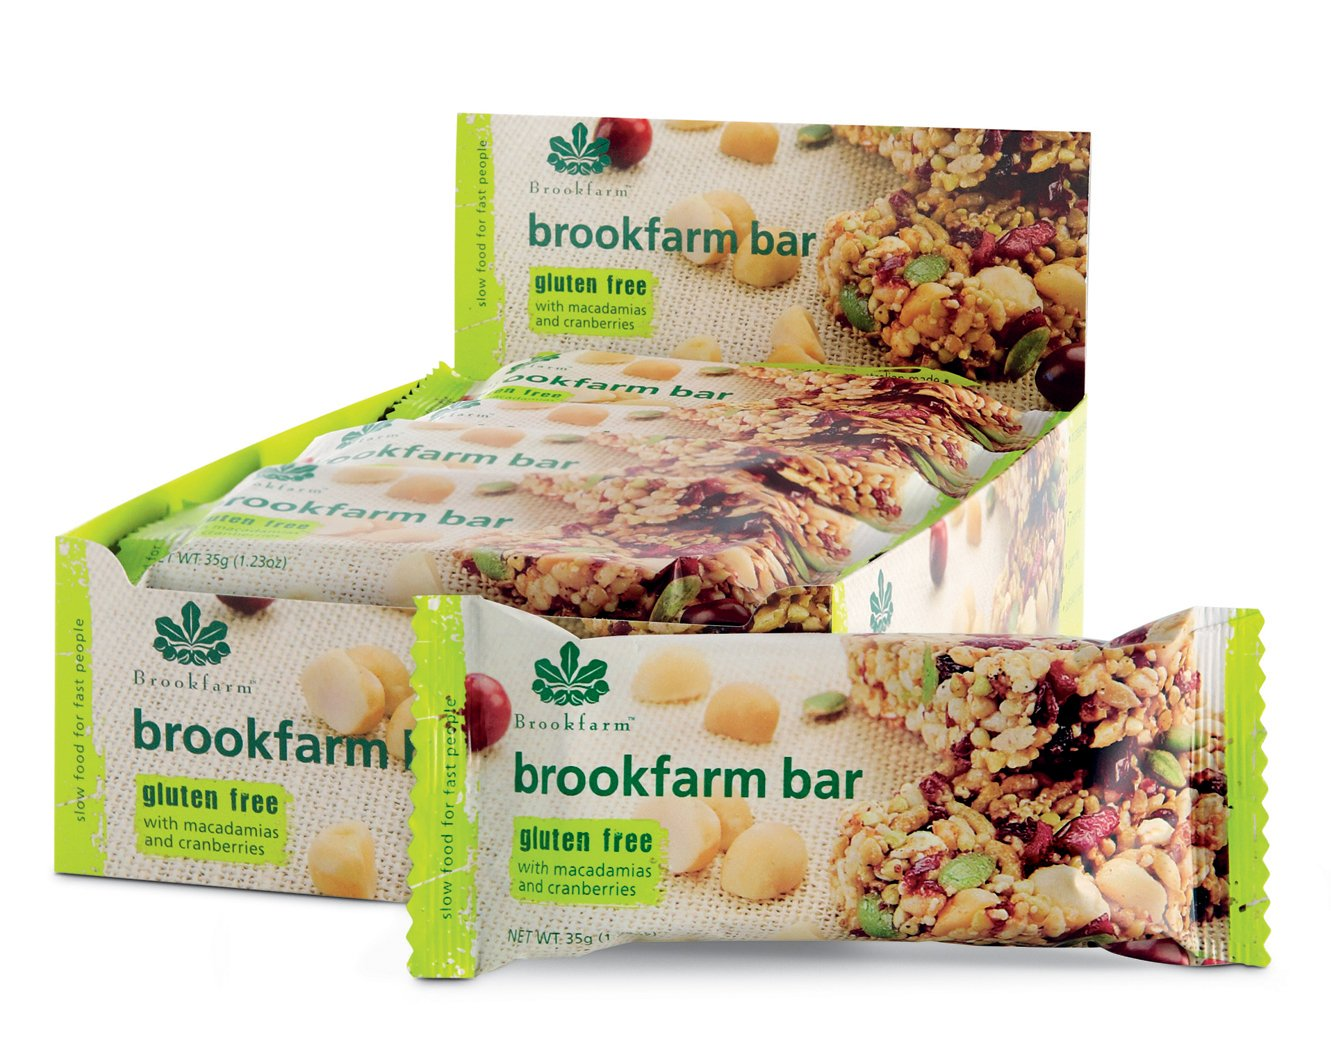 Brookfarm Gluten-Free Macadamia Muesli Bar with Cranberries, Carton of 12x1.2oz (12x35g) by Brookfarm (Image #2)